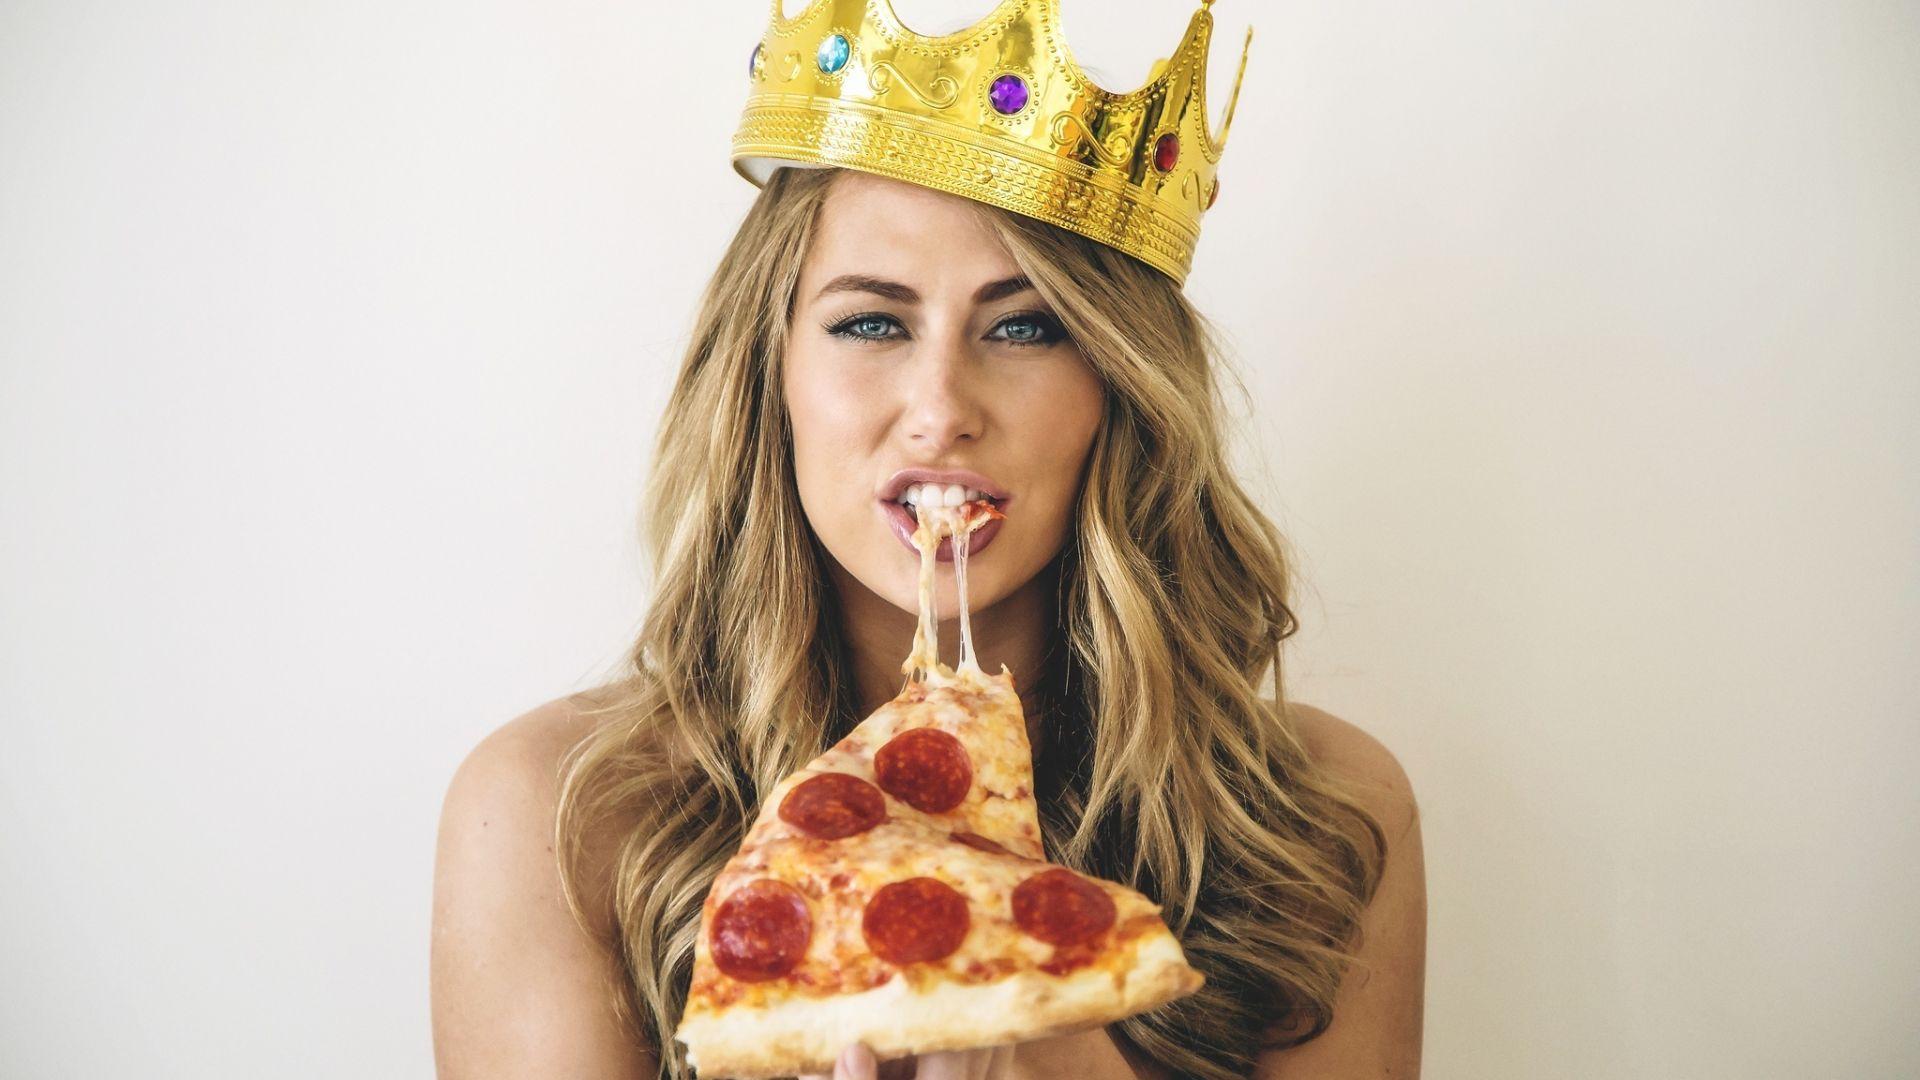 Wallpaper Girl model, eating, pizza, food, crown